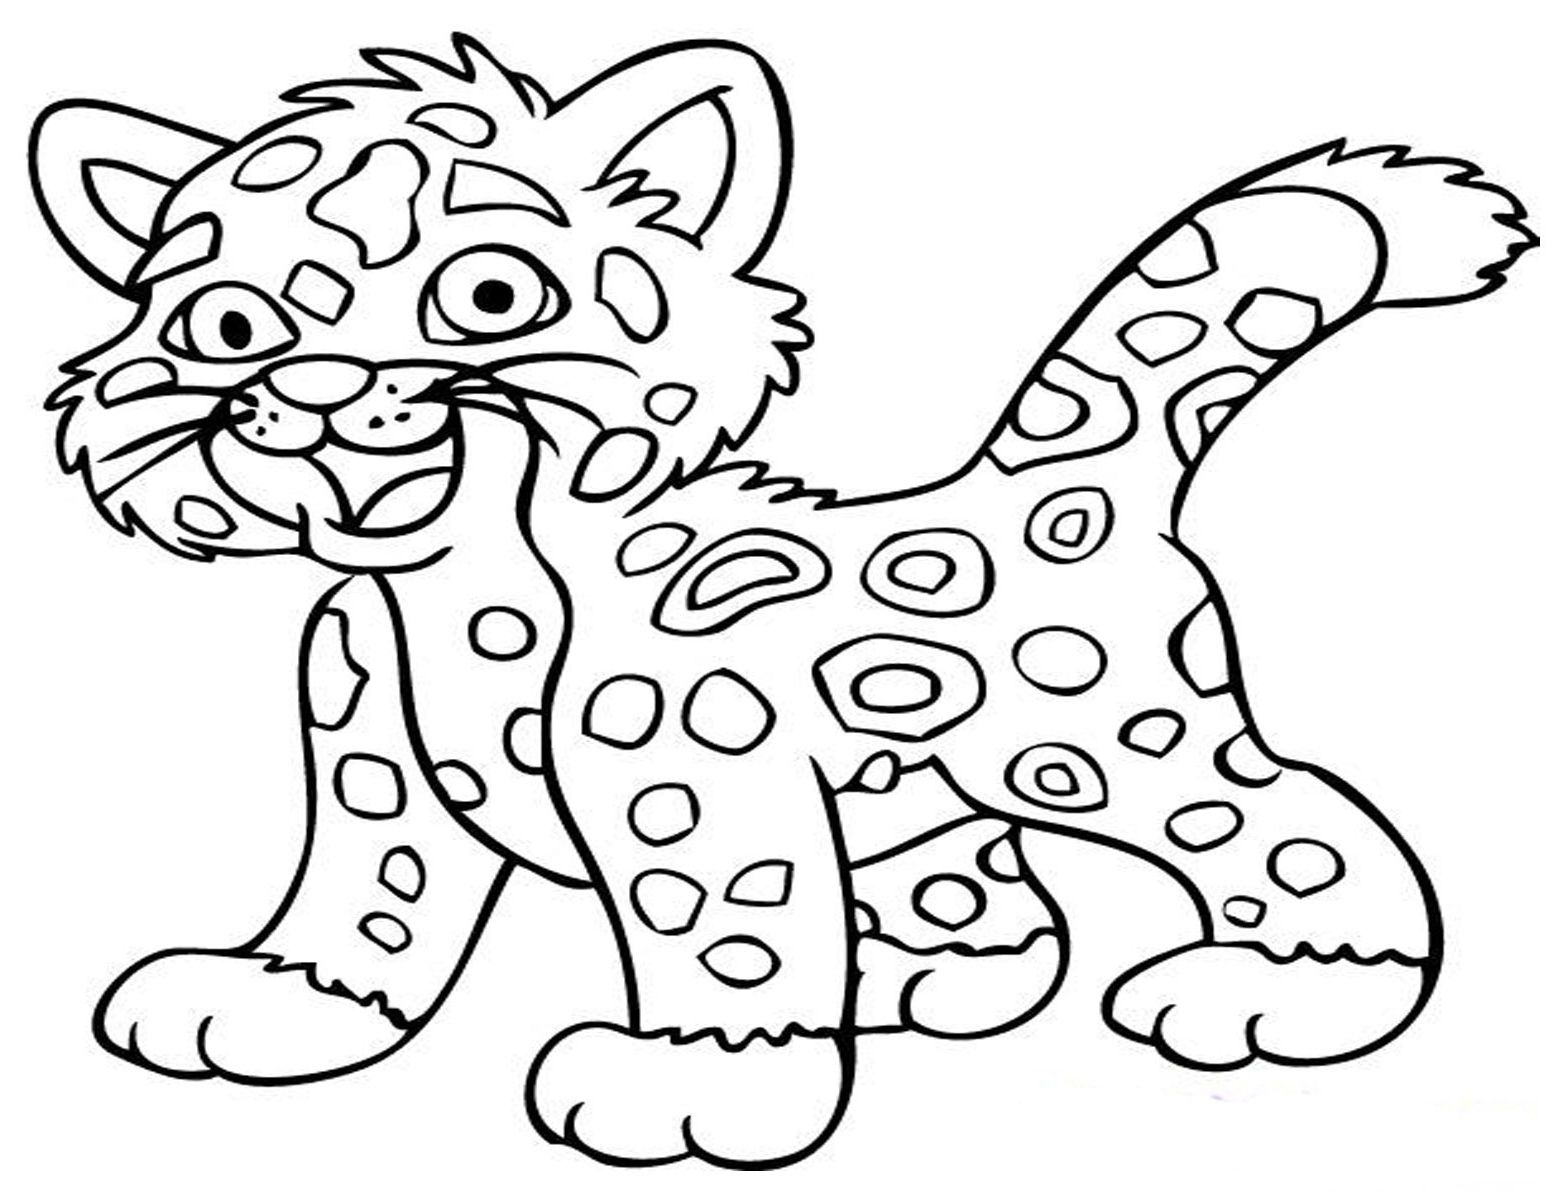 Jaguar Coloring Pages Best Coloring Pages For Kids Lion Coloring Pages Free Printable Coloring Pages Zoo Animal Coloring Pages [ 1200 x 1548 Pixel ]